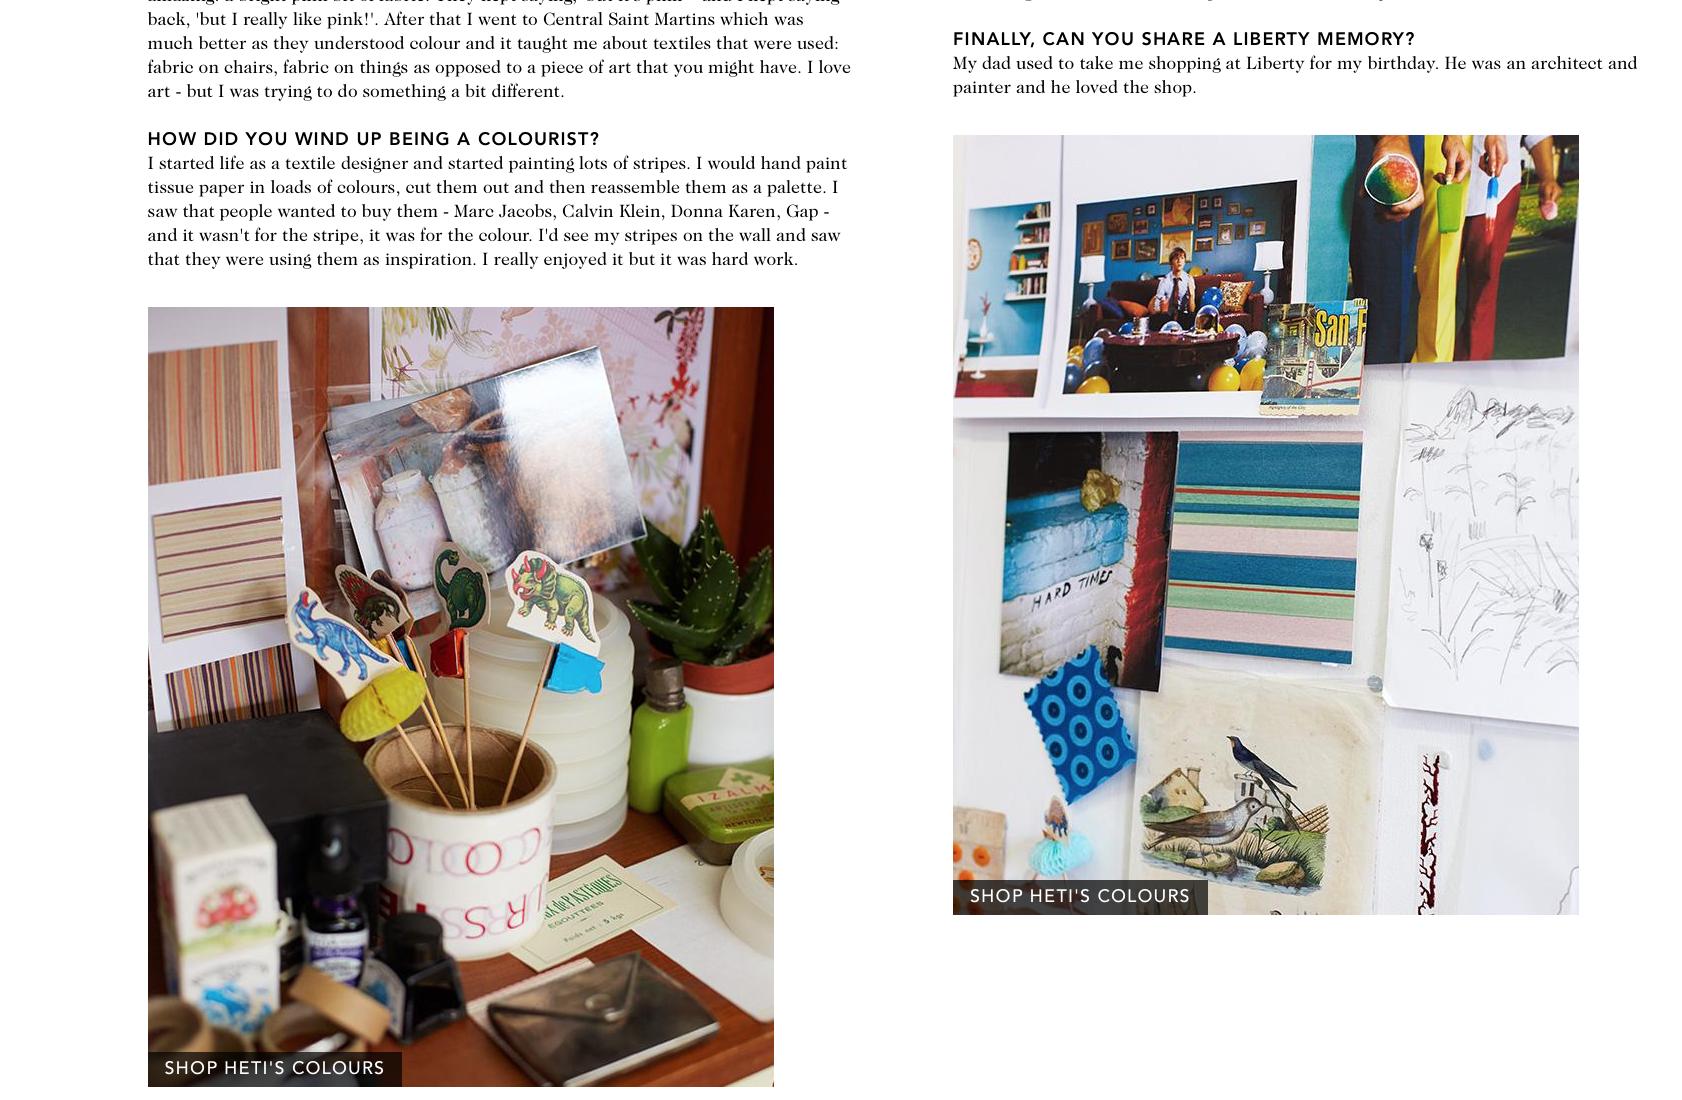 Liberty London Luxury Designer Scarves Heti's colours colour textiles Design Studio